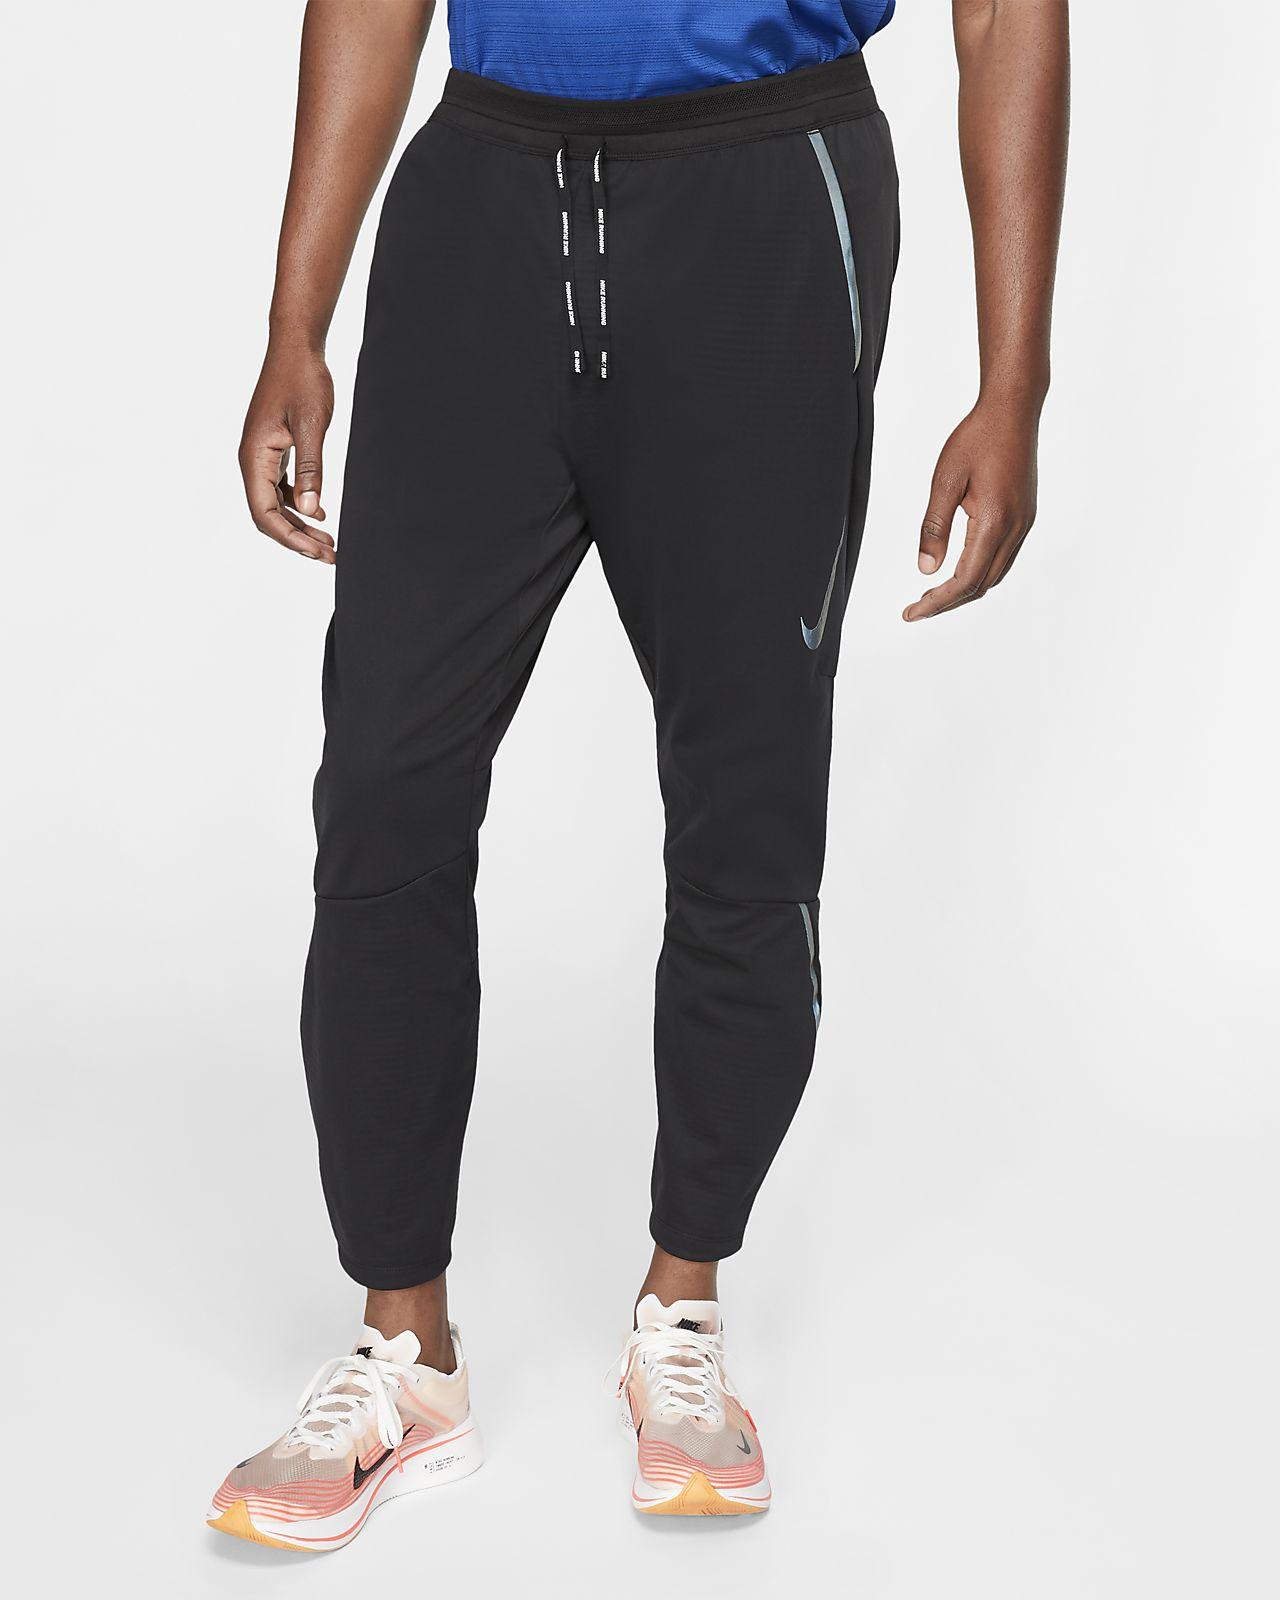 Nike Shield Swift férfi futónadrág